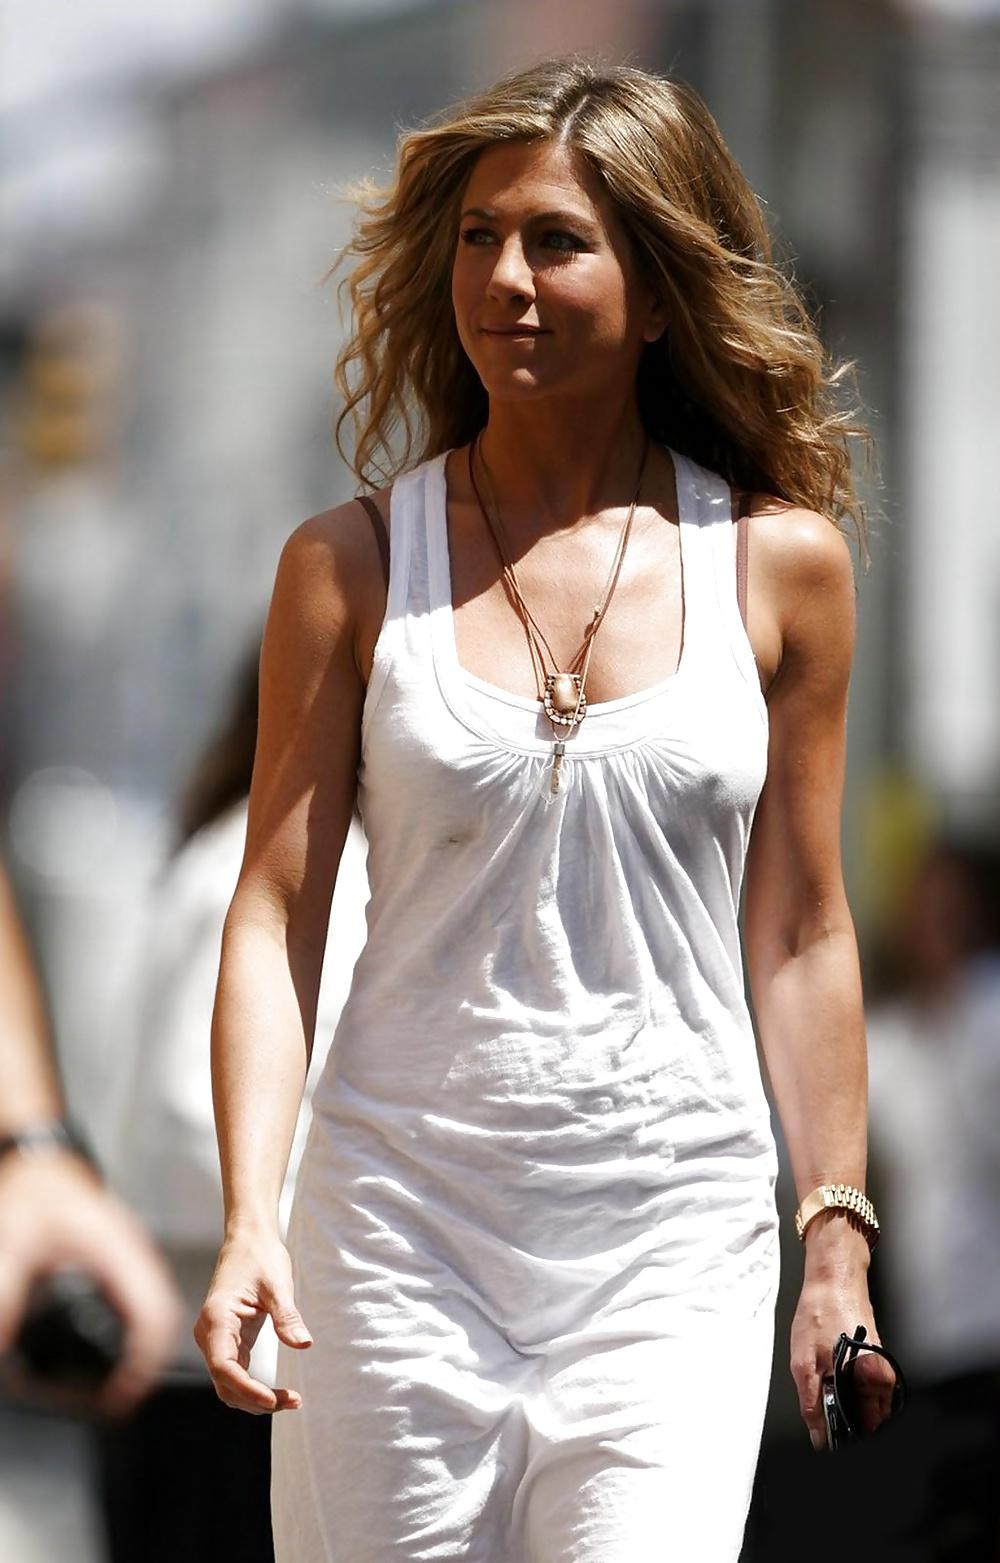 bag-videos-jennifer-aniston-friends-pics-nipples-uniform-sexy